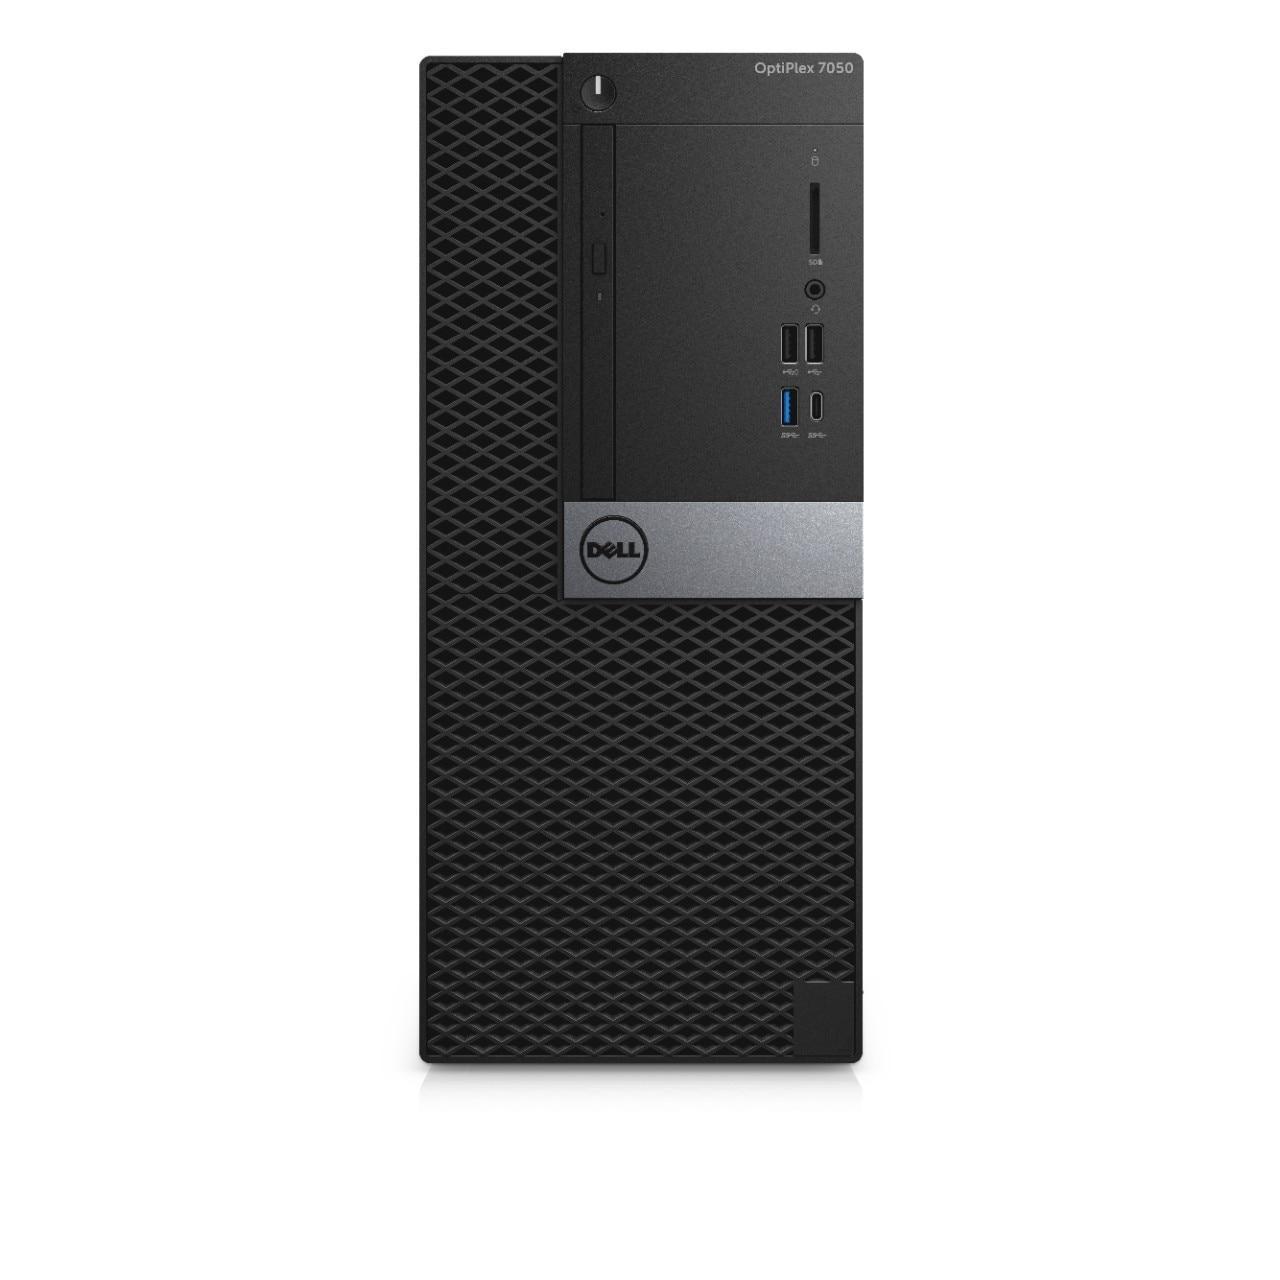 Dell OptiPlex 7050 Core i5 3.2 GHz GHz - SSD 256 GB RAM 8GB